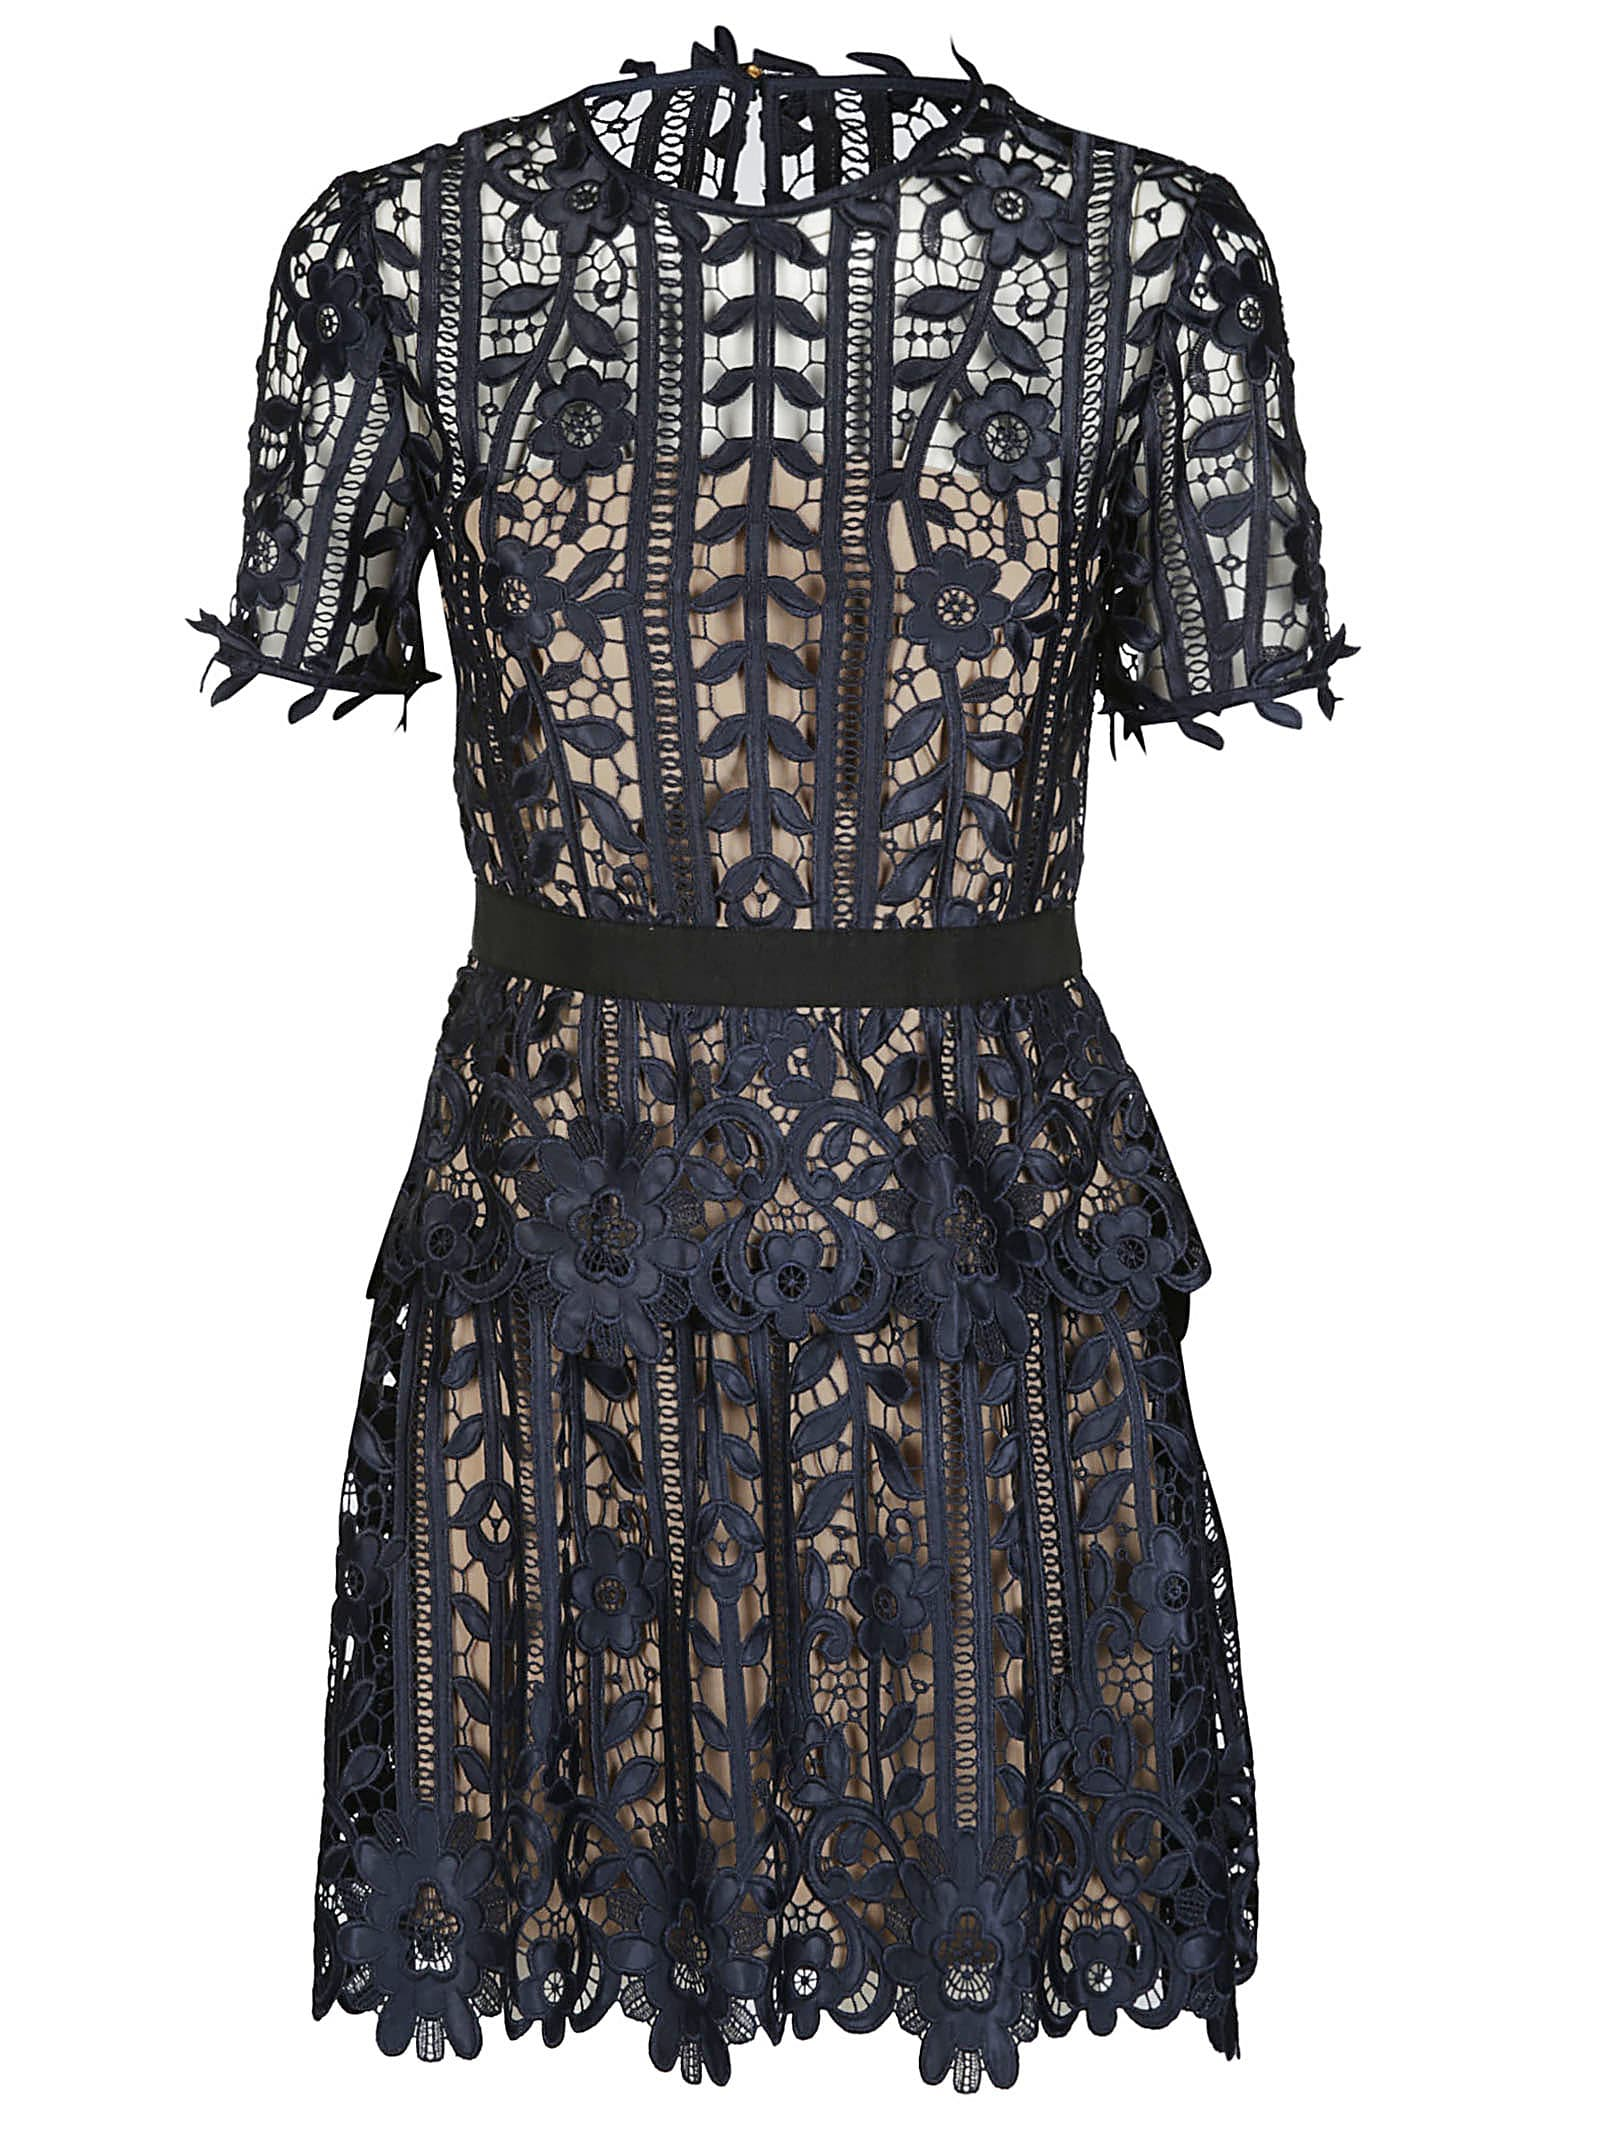 Buy self-portrait Scallop-edge Lace Midi Dress online, shop self-portrait with free shipping